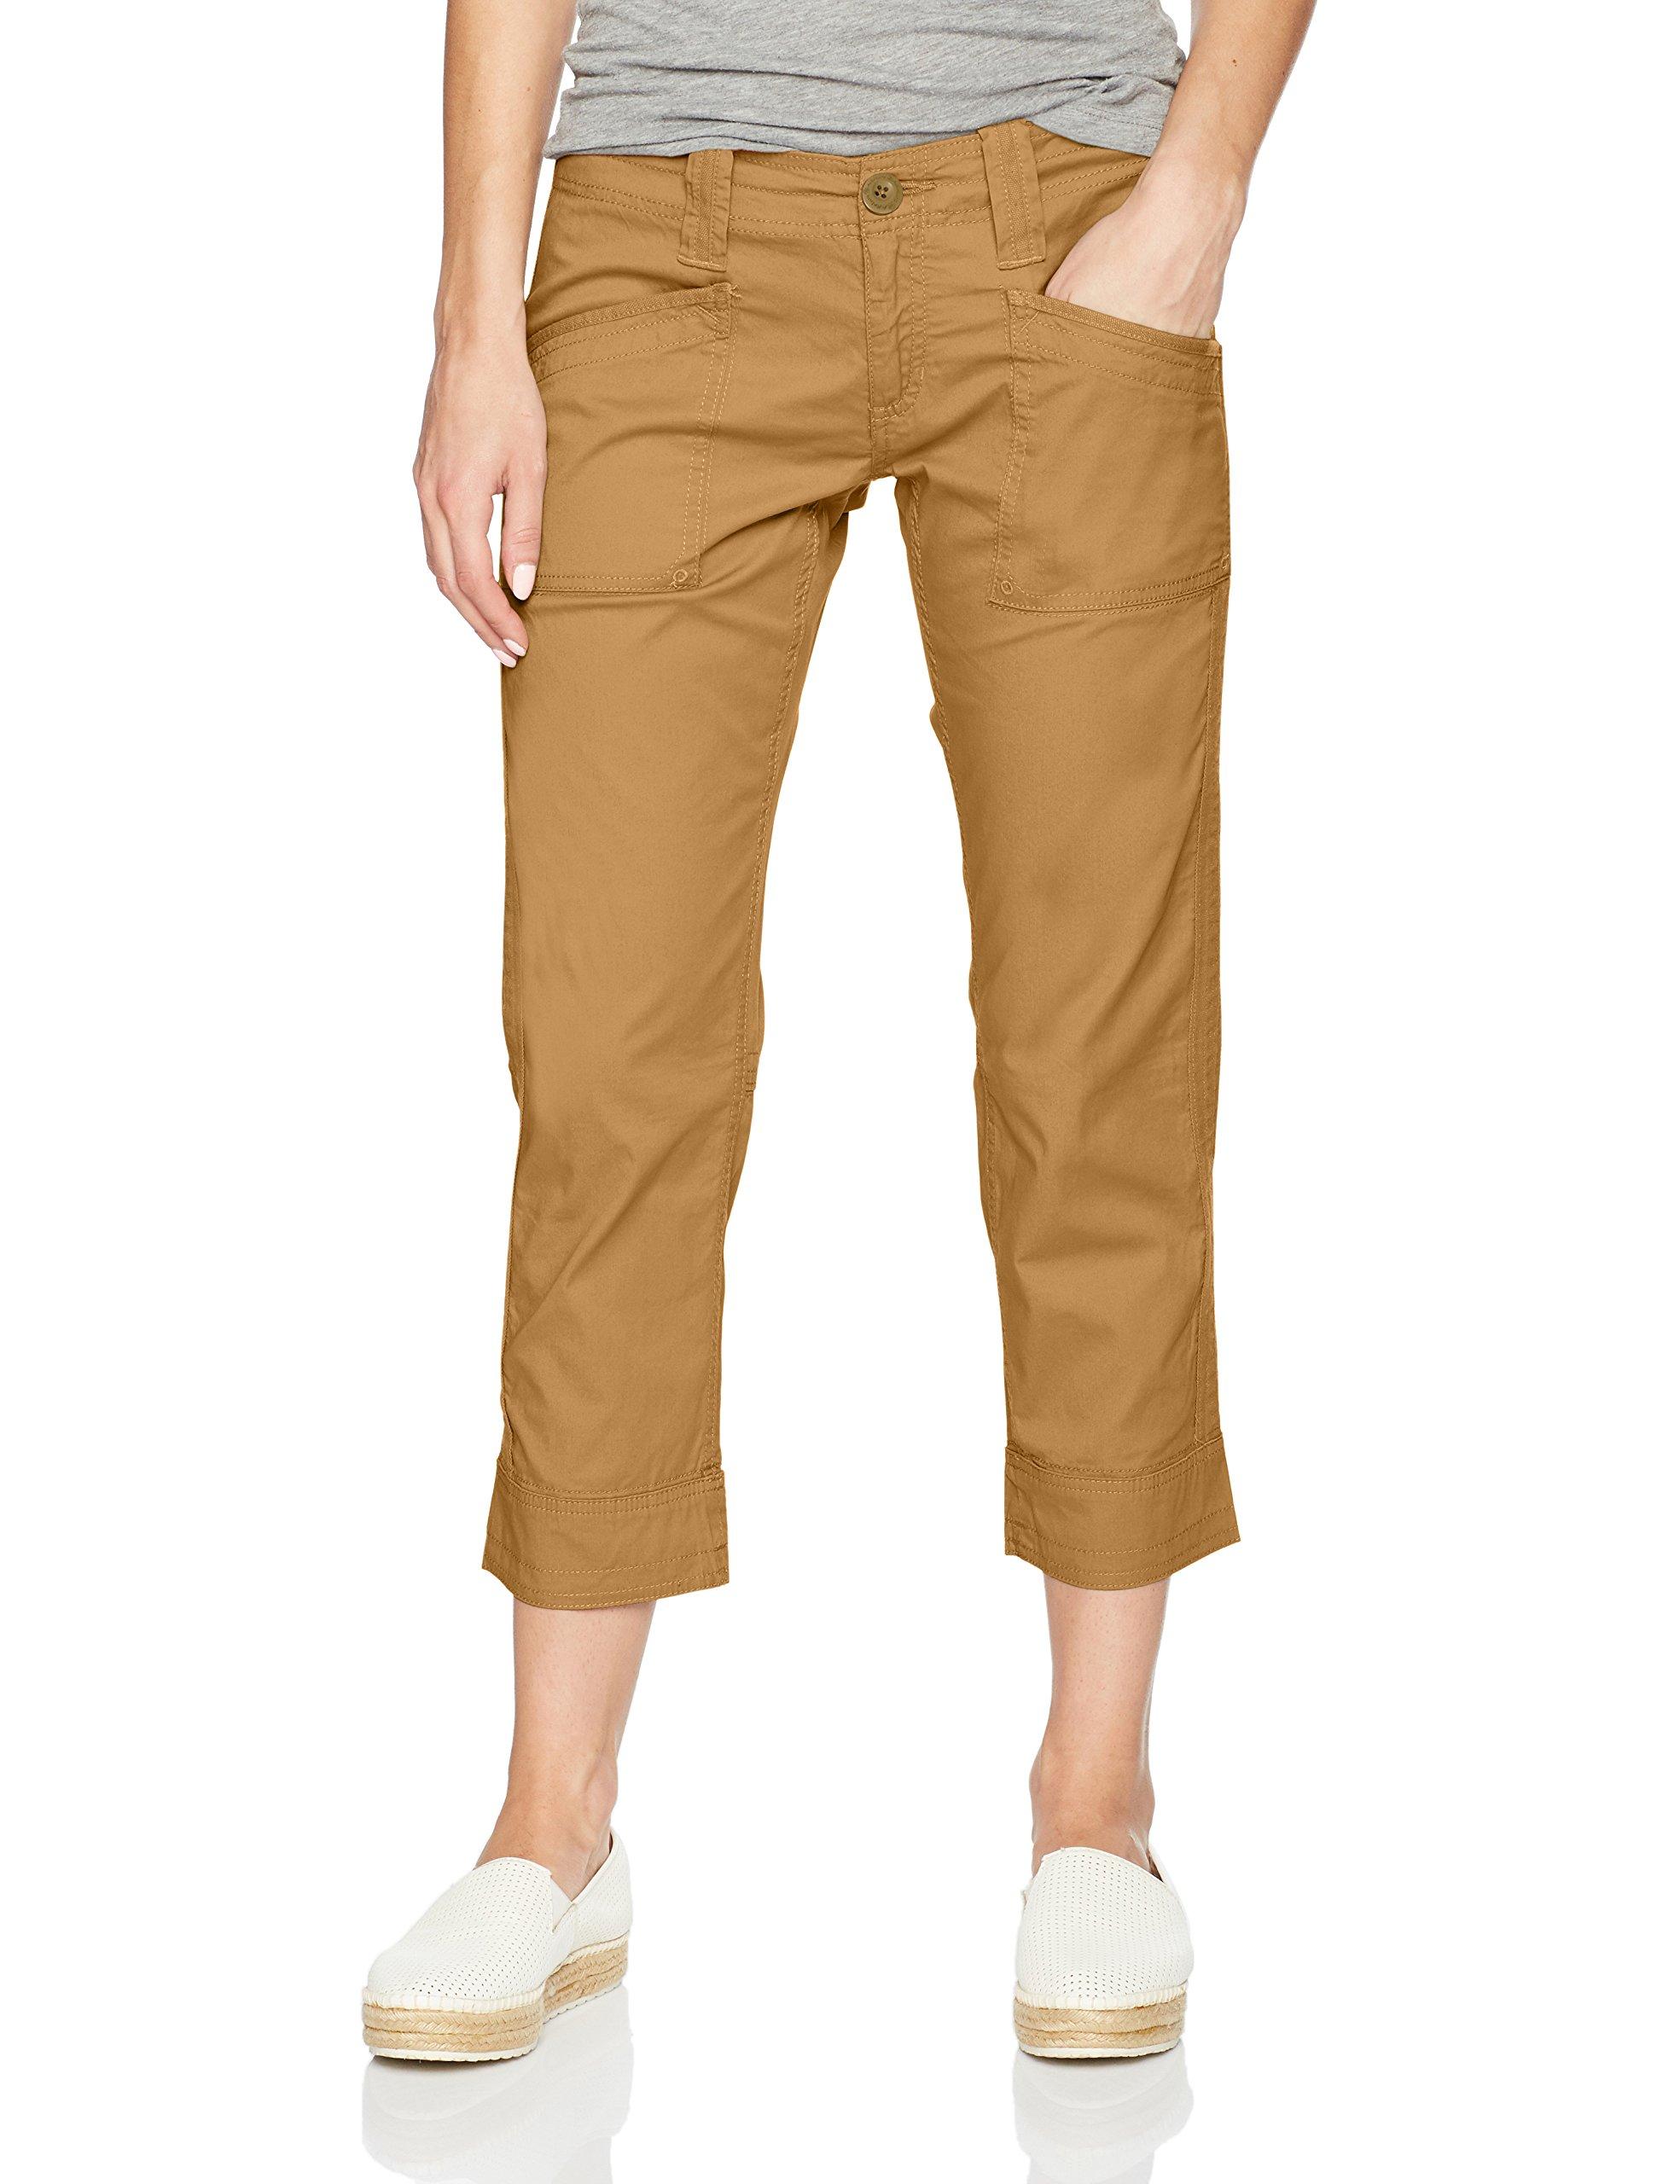 Aventura Women's Arden Slimmer Pant, Dark Khaki, 10